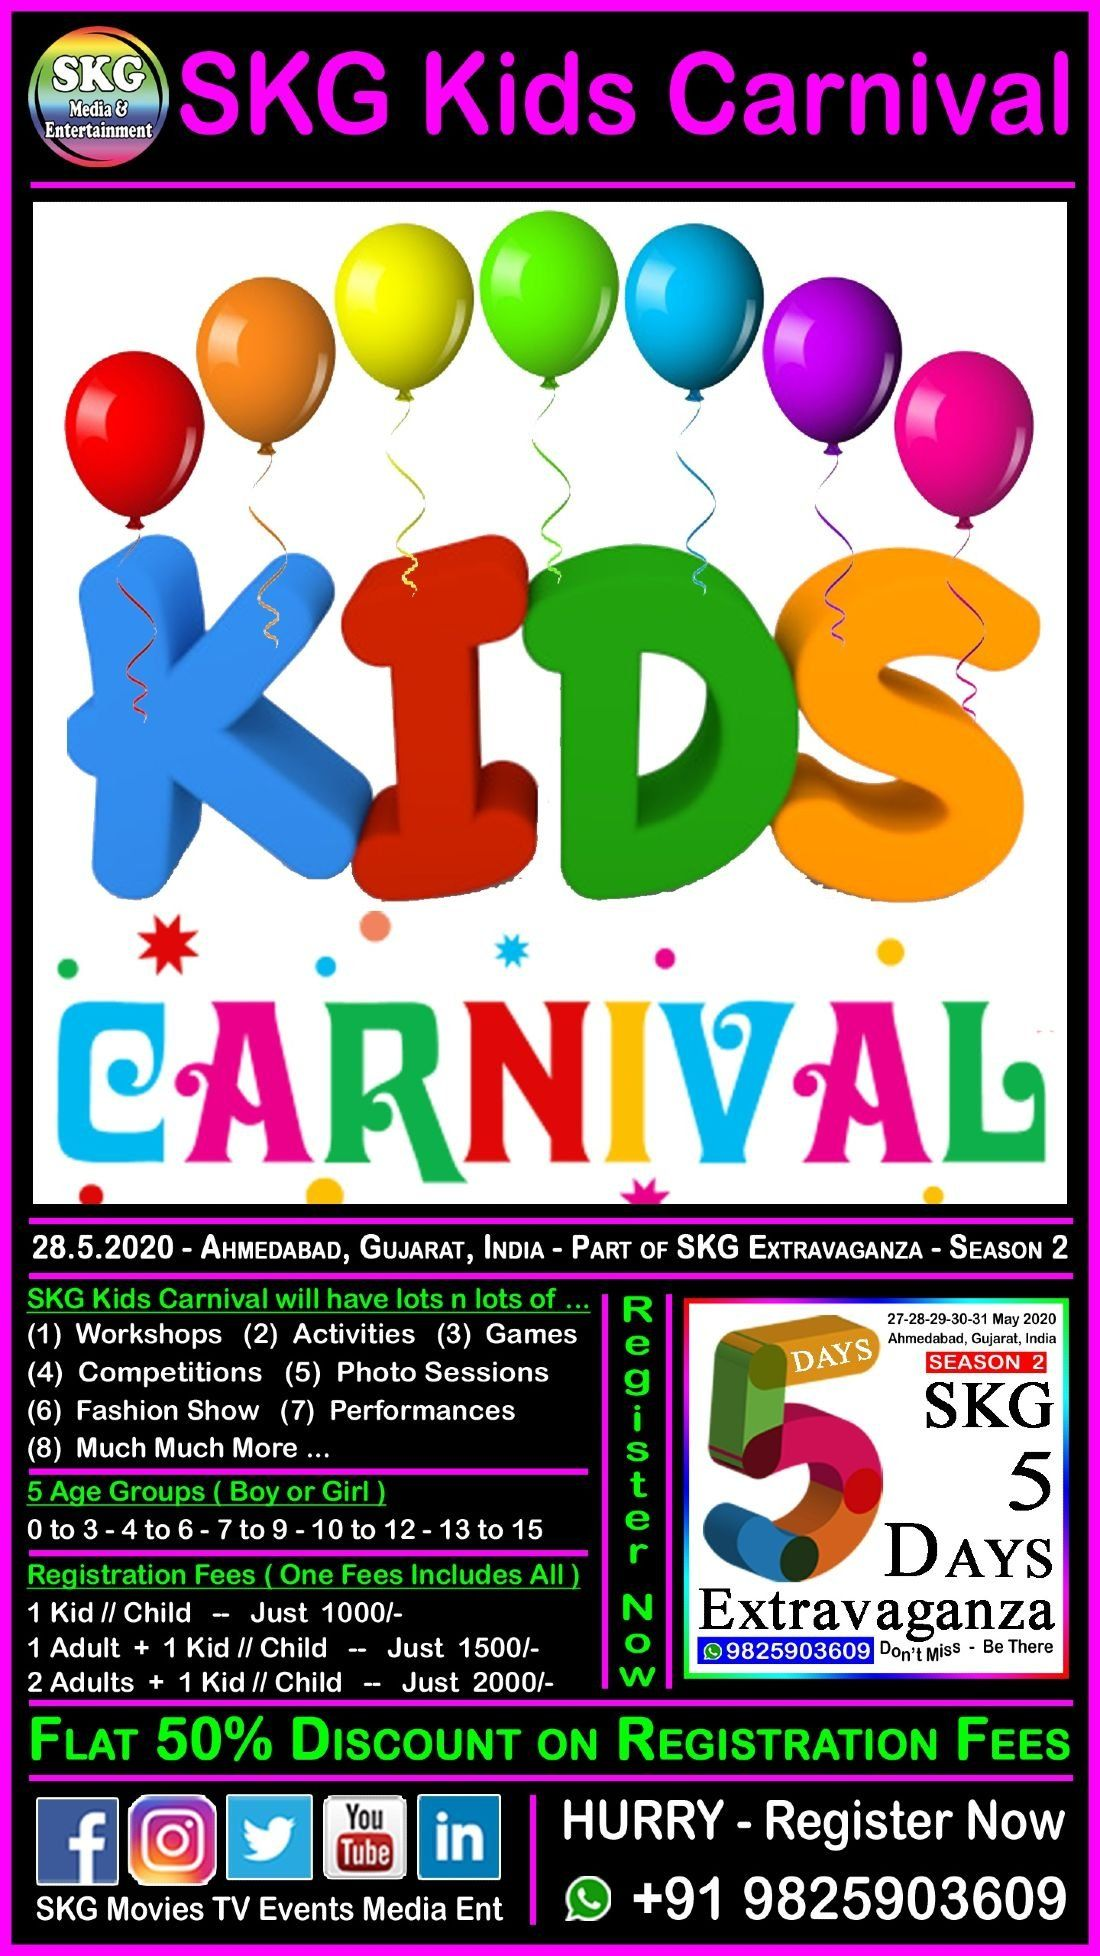 SKG Kids Carnival - Part of SKG 5 Days Extravaganza - Season 2